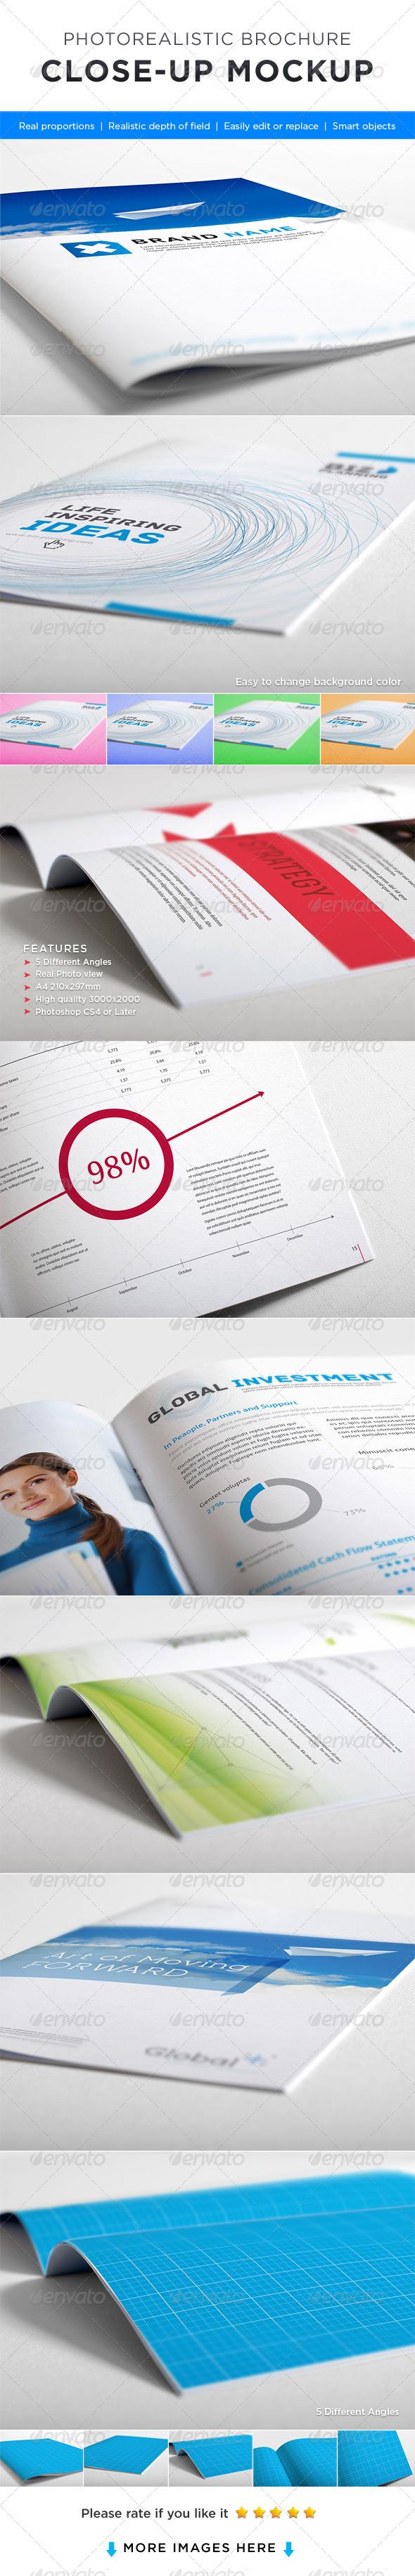 Photorealistic Brochure Close-up Mock-up - Brochures Print